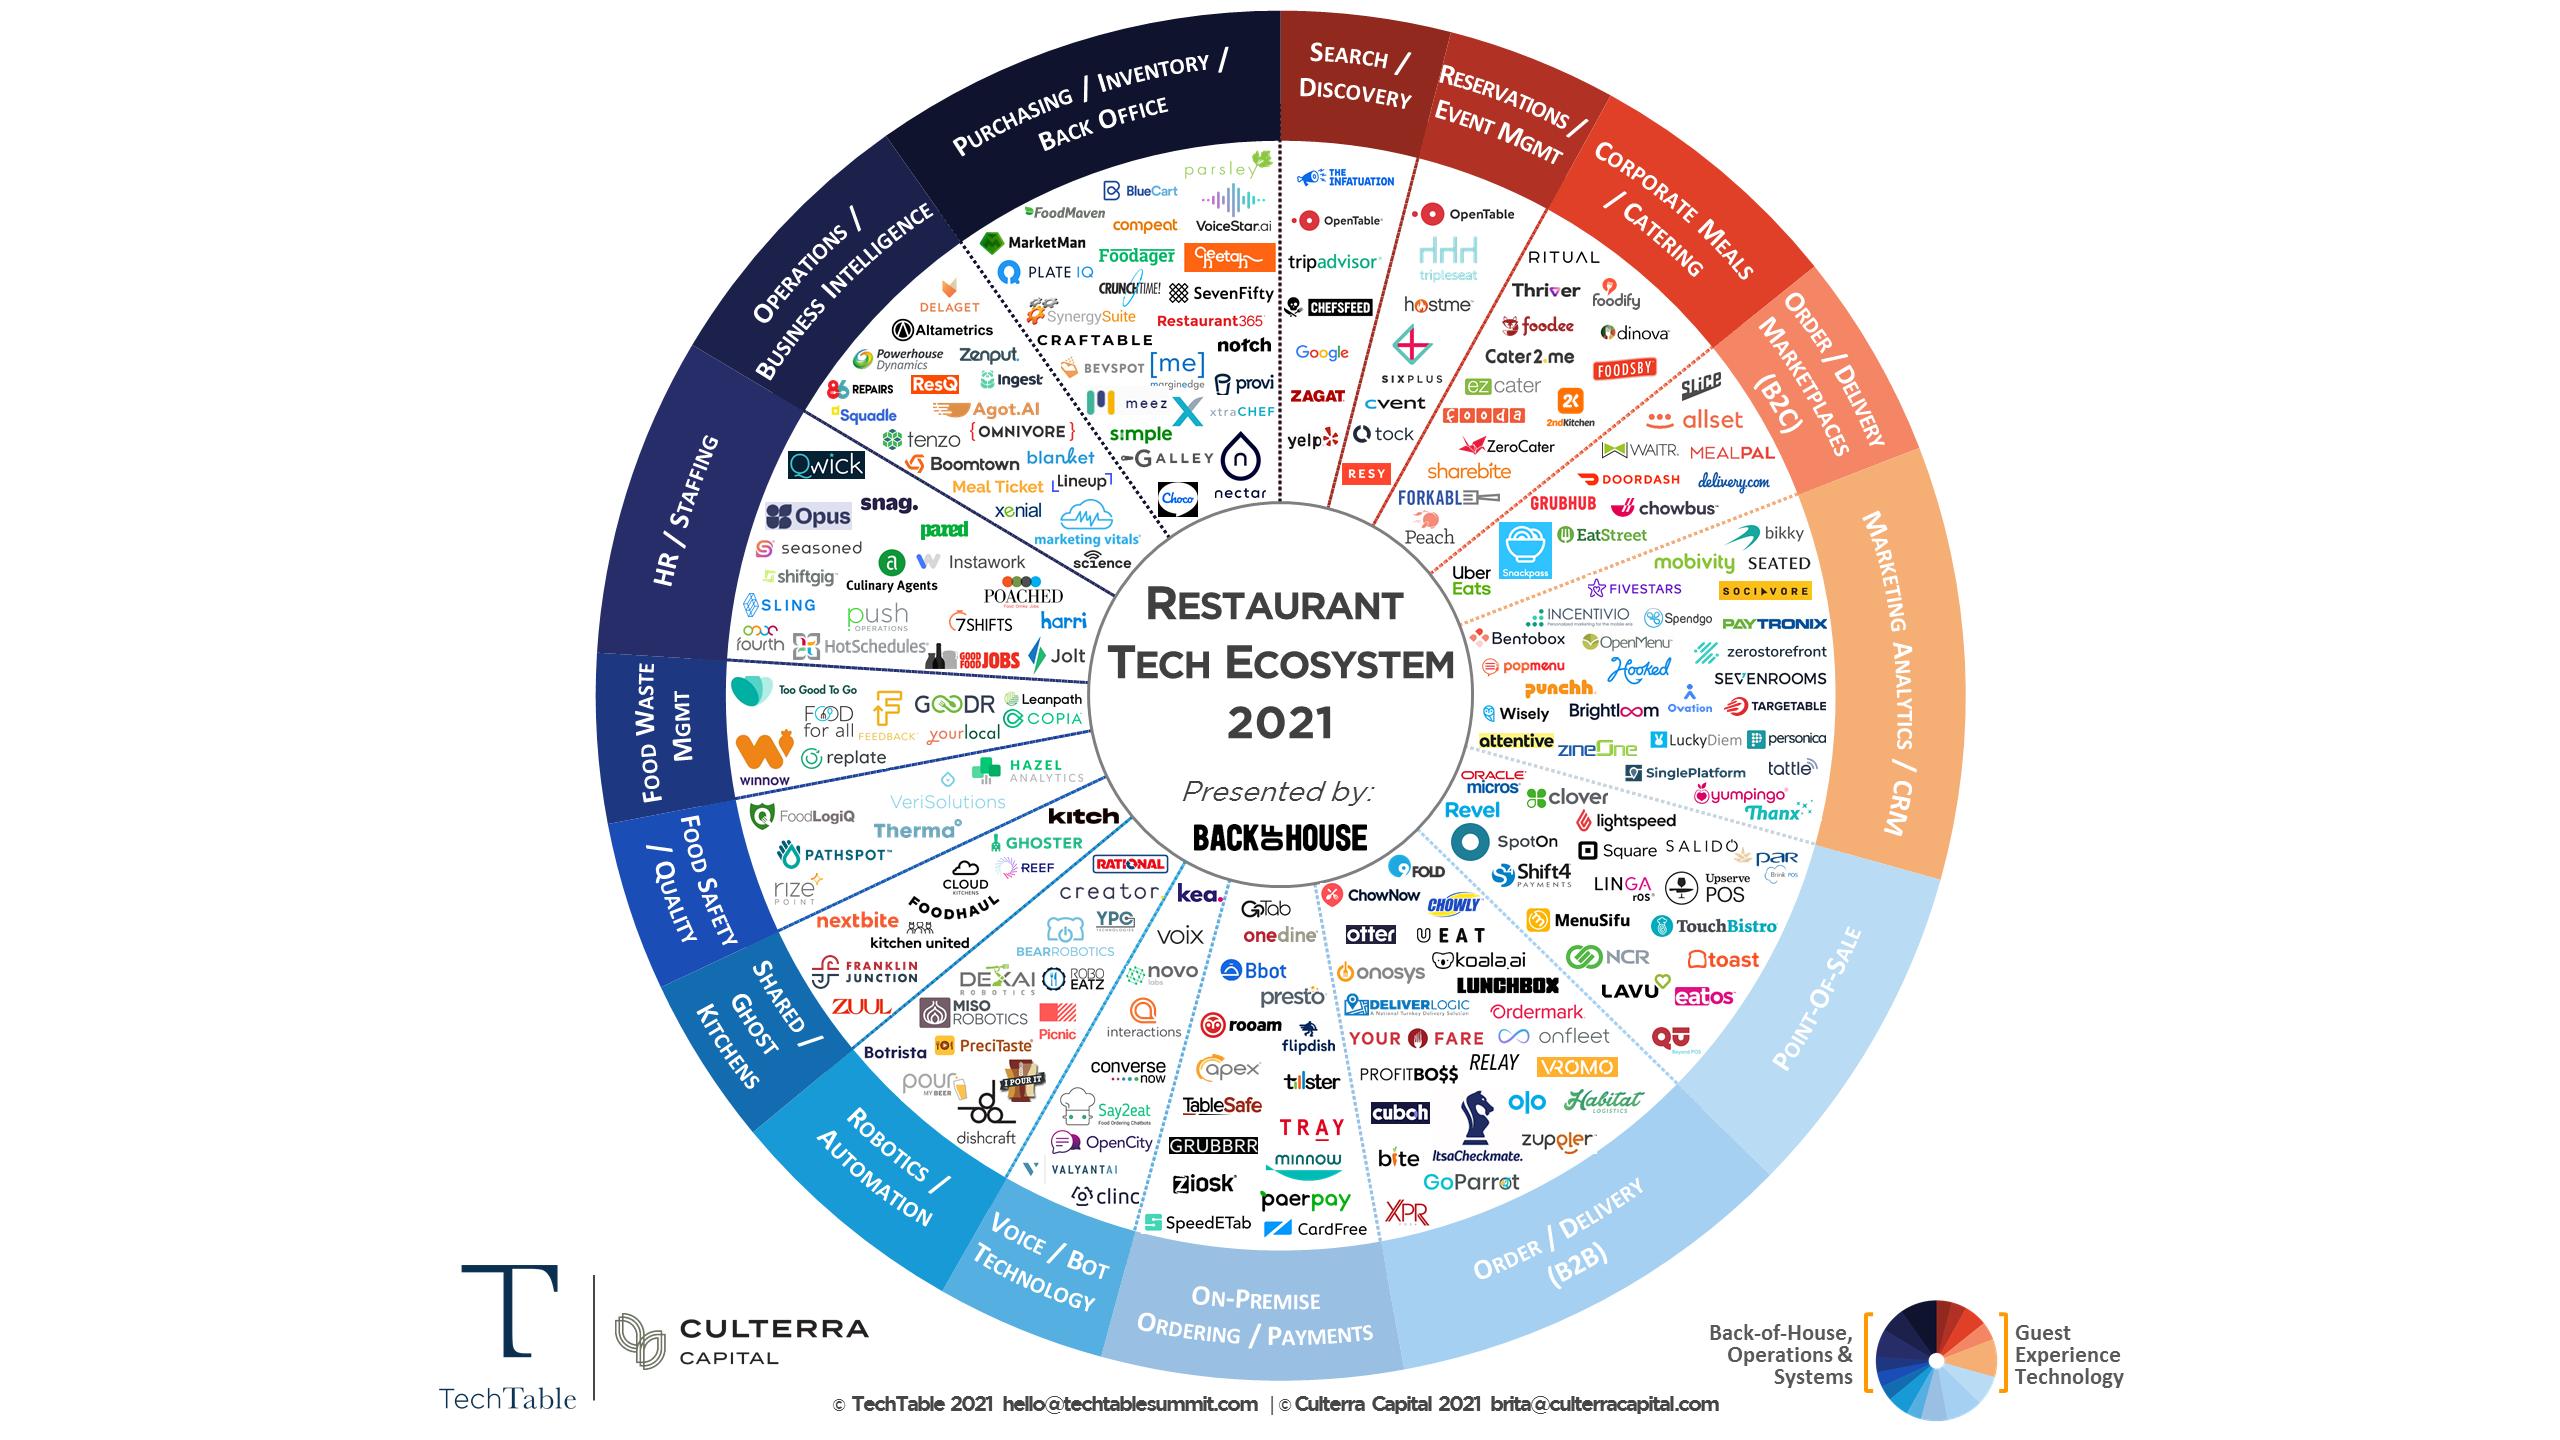 TechTable and Culterra Capital Release 2021 Restaurant Tech Ecosystem Map